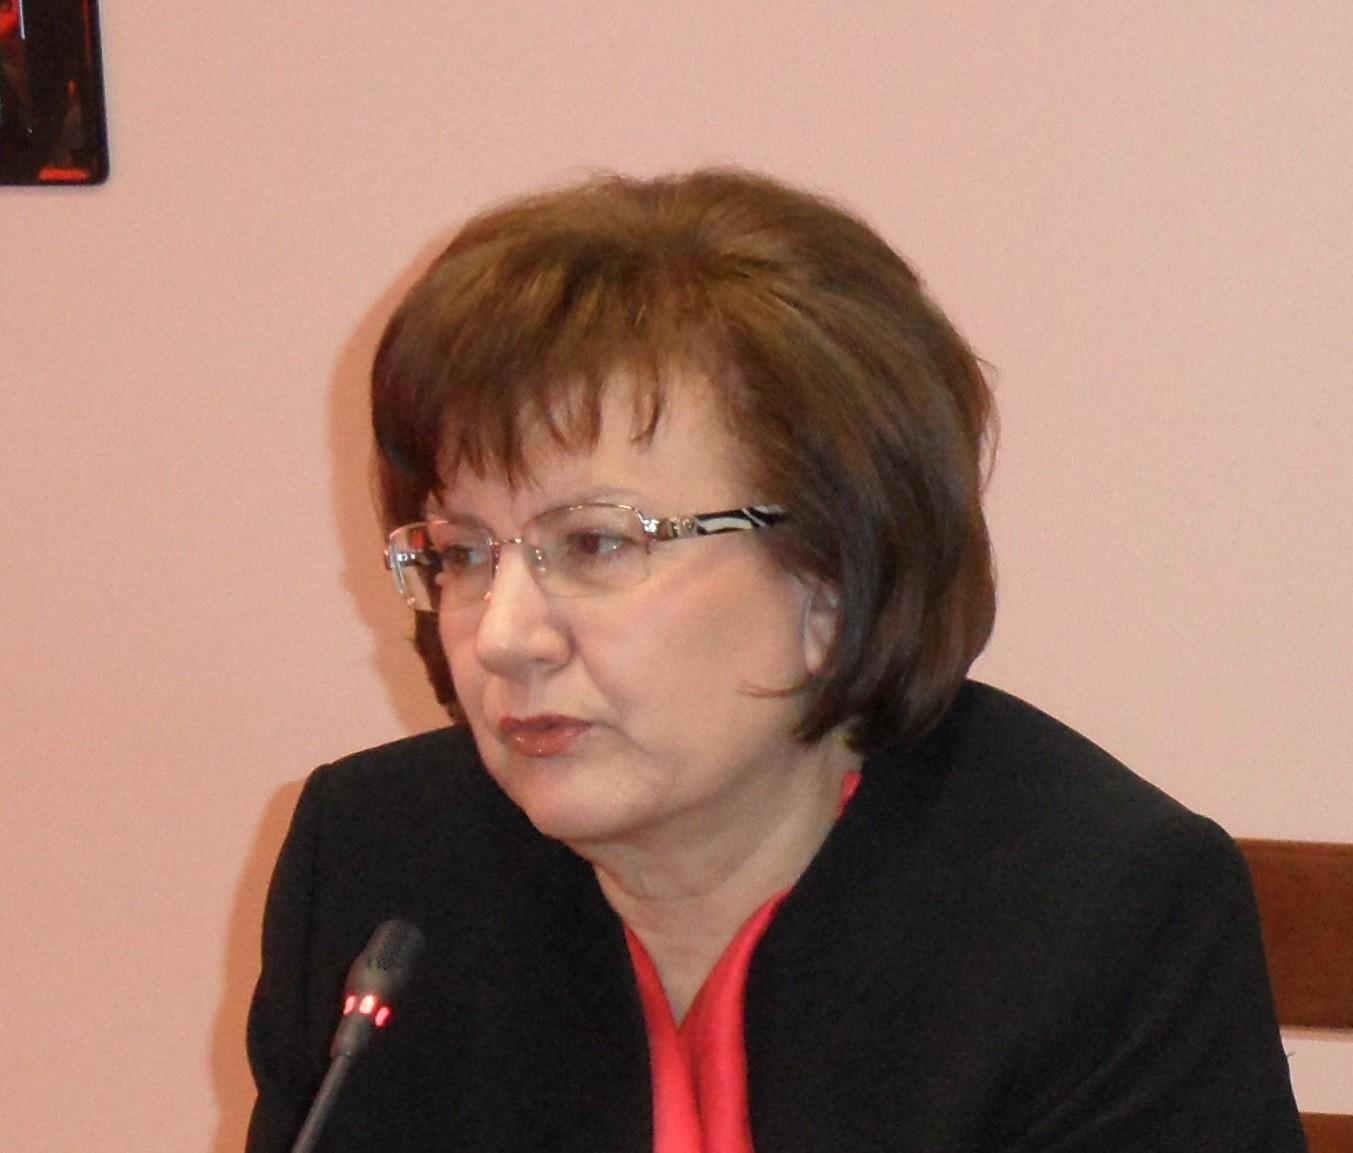 Prof. Maria Nowicka-Skowron